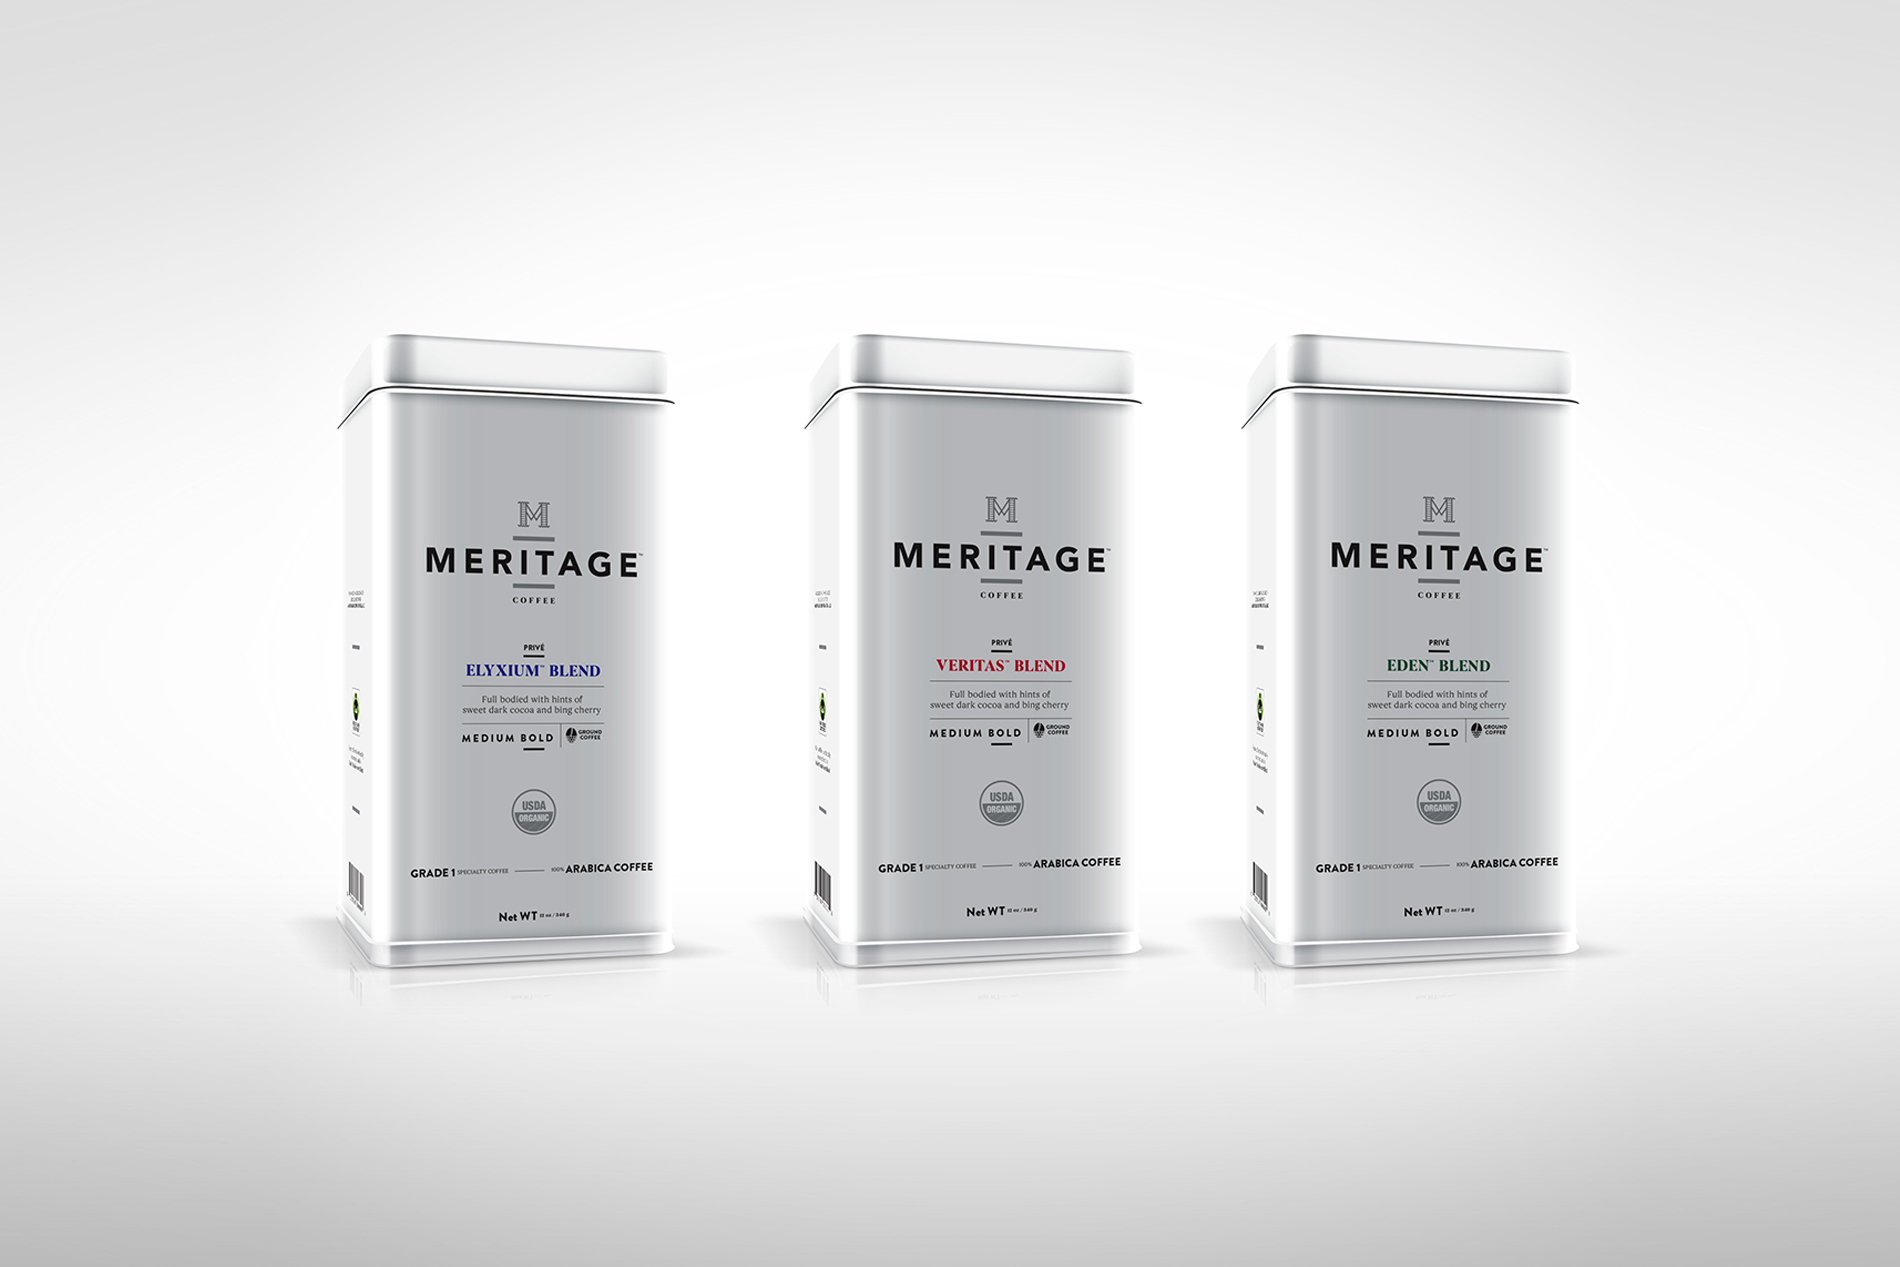 Dedica Group Meritage Coffee Packaging Featured On The Dieline.